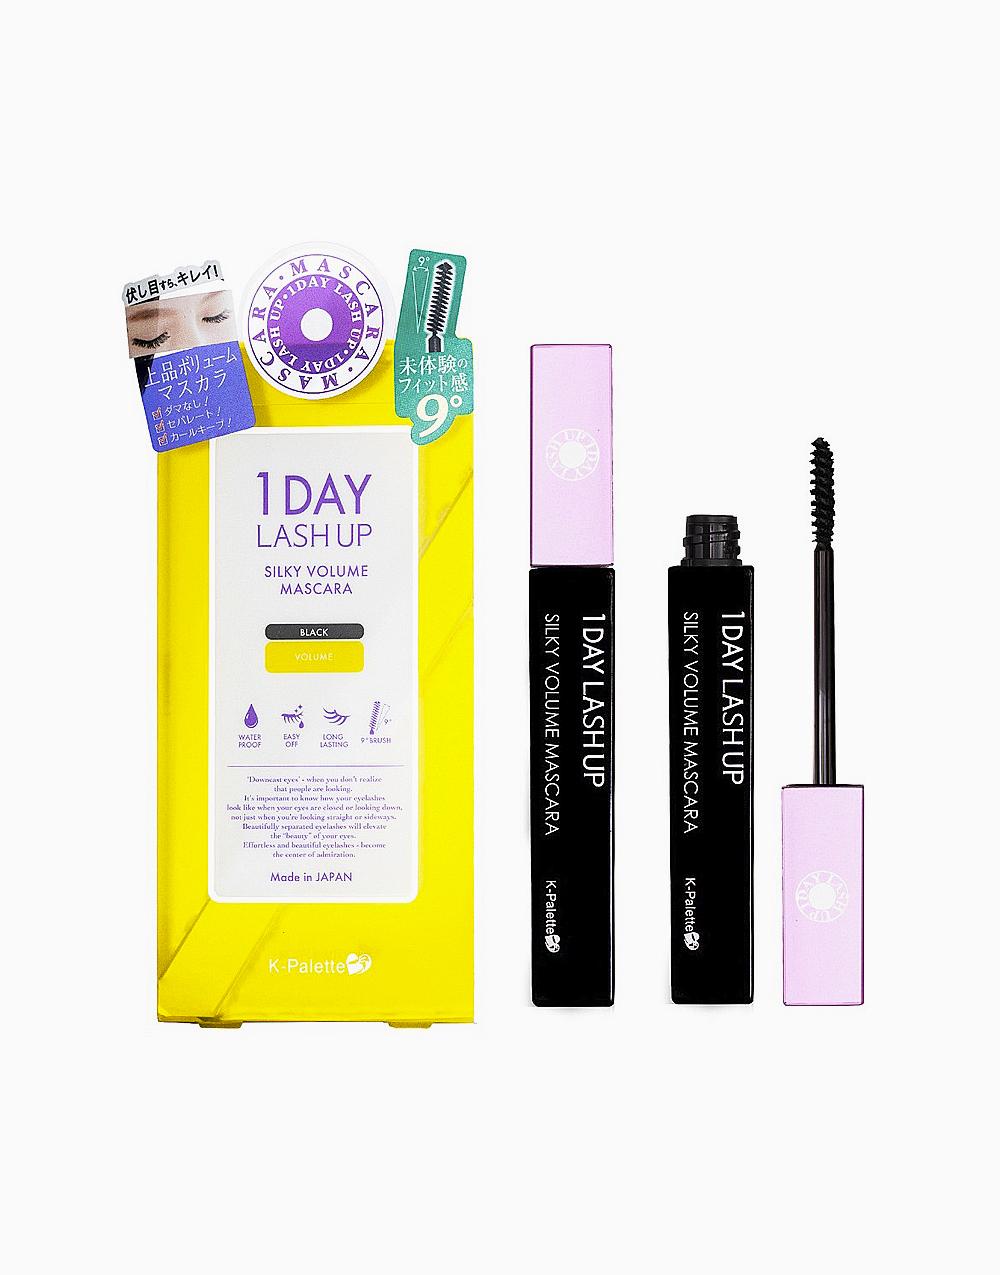 1Day Lash Up Mascara by K-Palette | Silky Volume